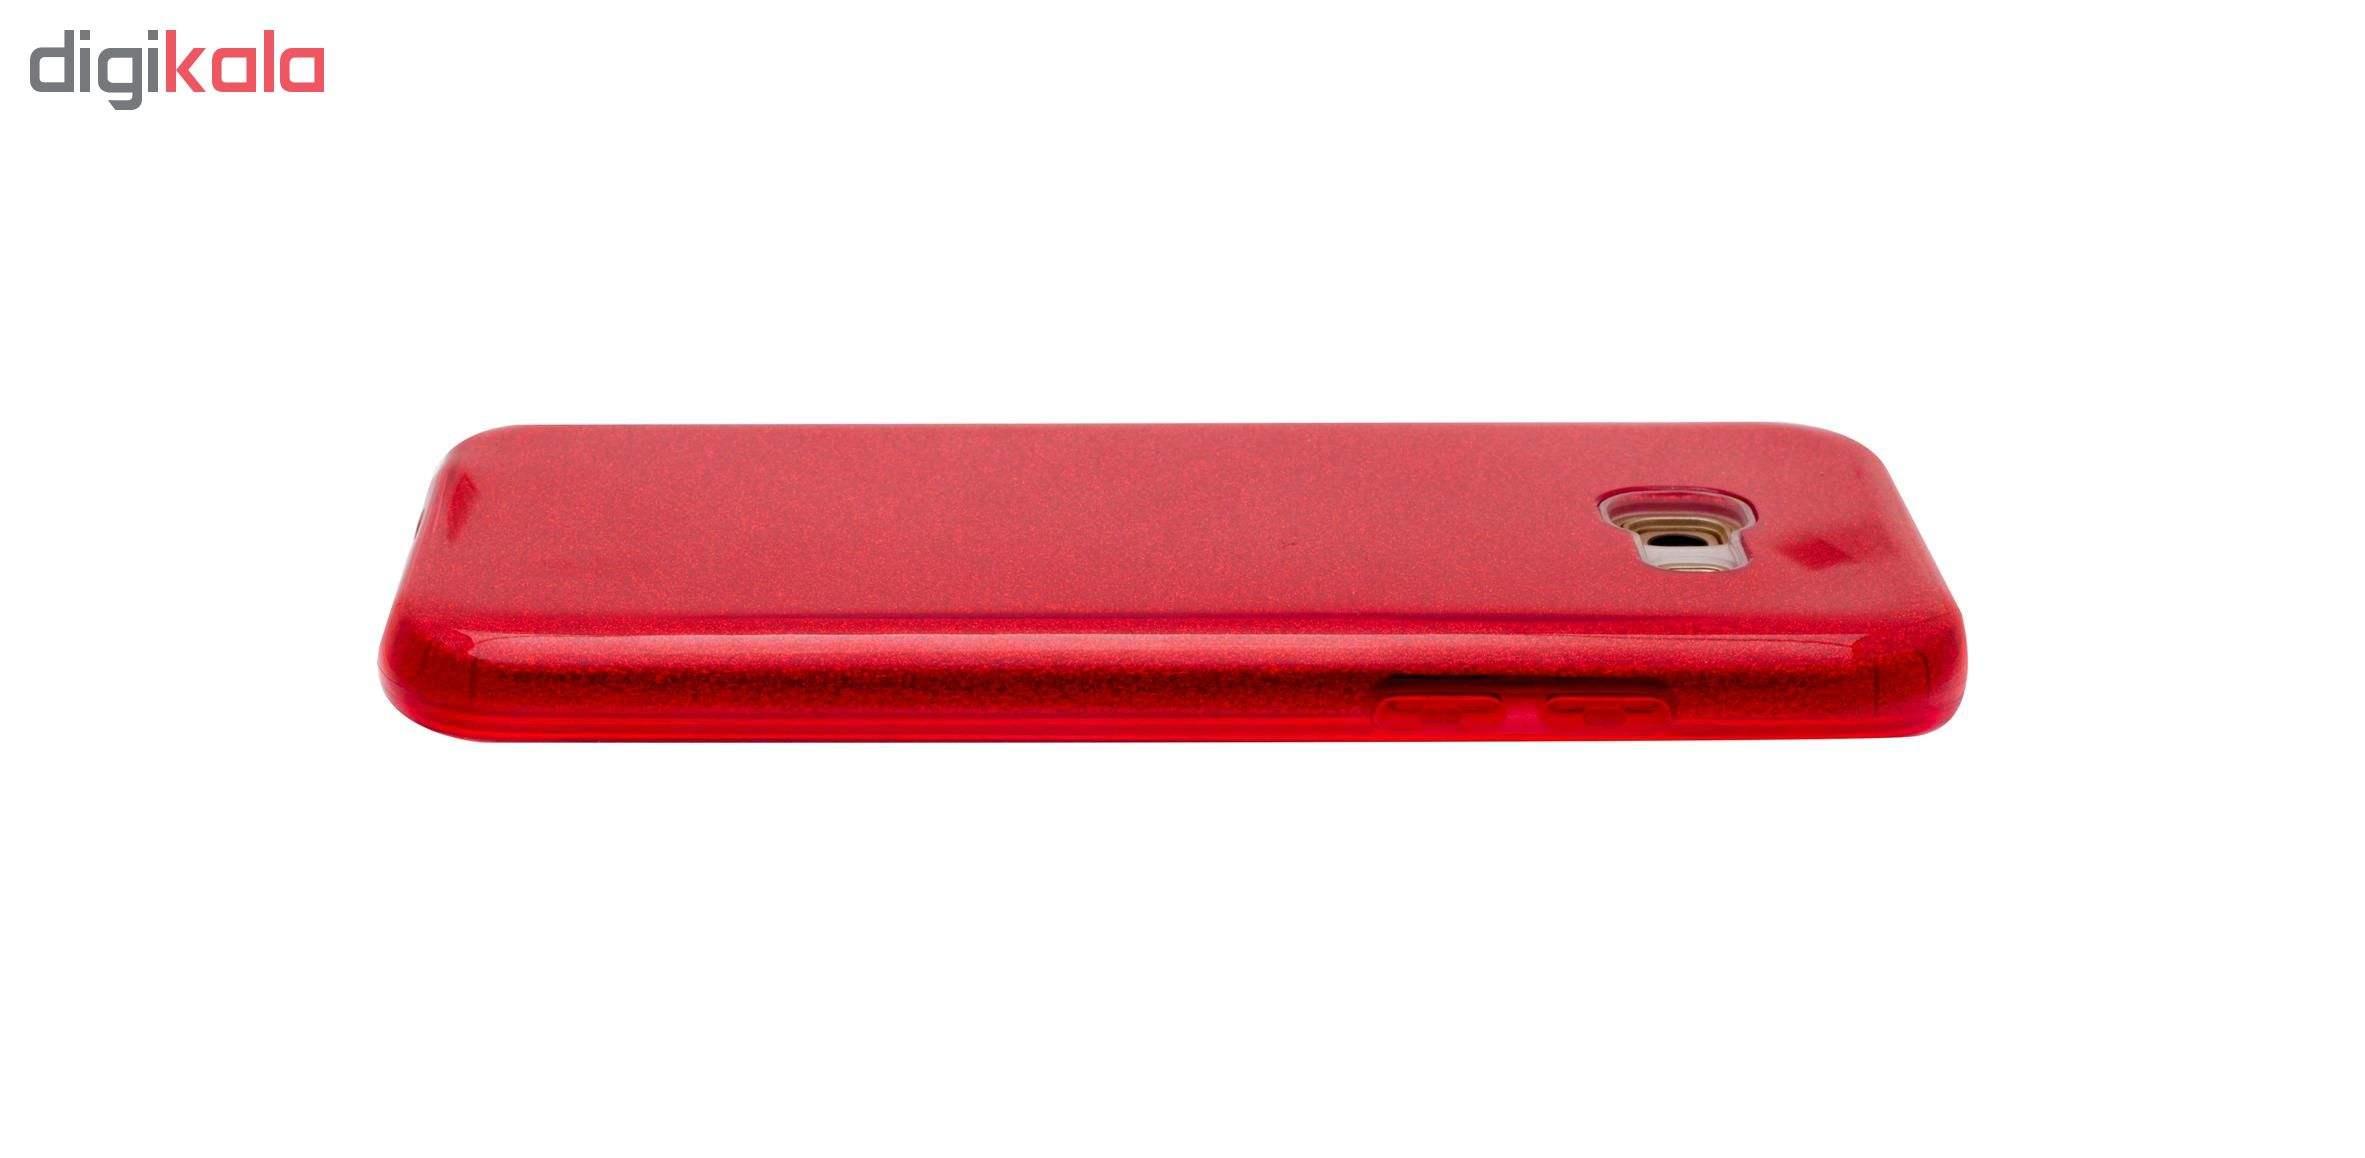 کاور مدل CORONA طرح اکلیلی مناسب برای گوشی سامسونگ گلکسی A5 2017 / A520 main 1 4